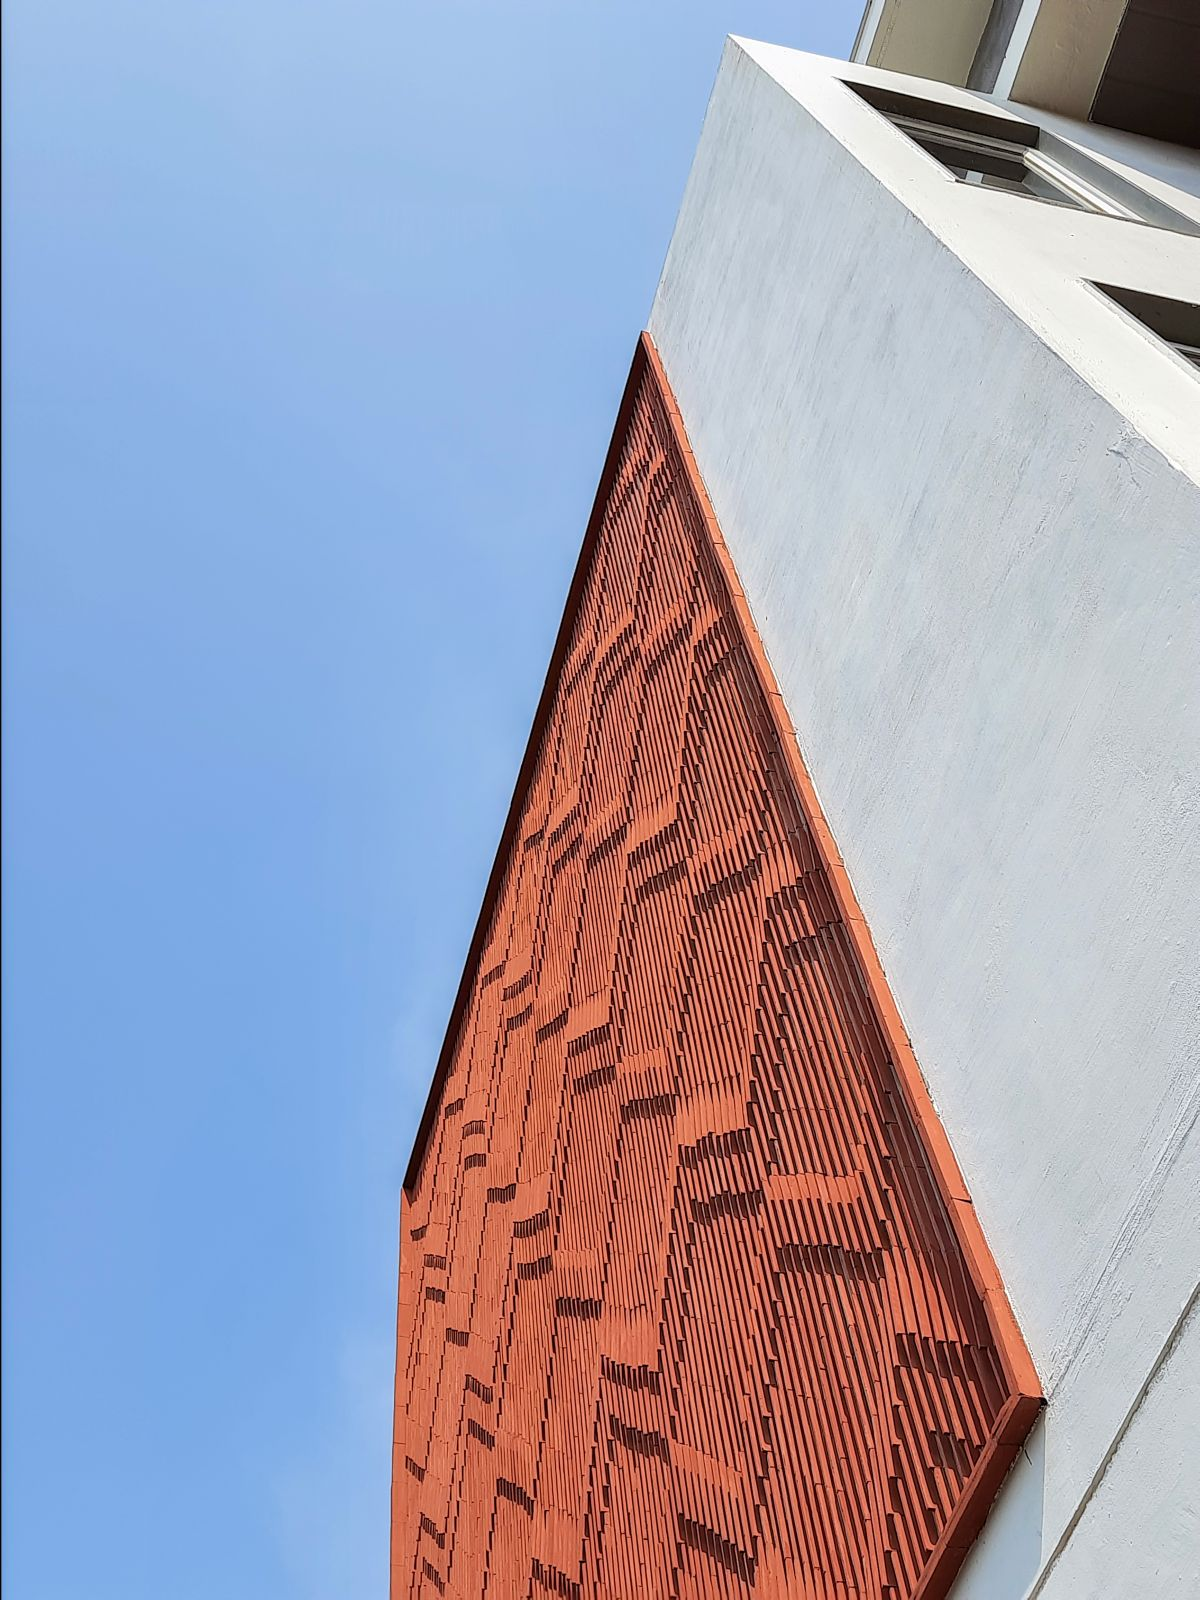 Clay roof tiles façade to minimize heat gain and has decorative function, at Vadodara, by Manoj Patel Design Studio 68